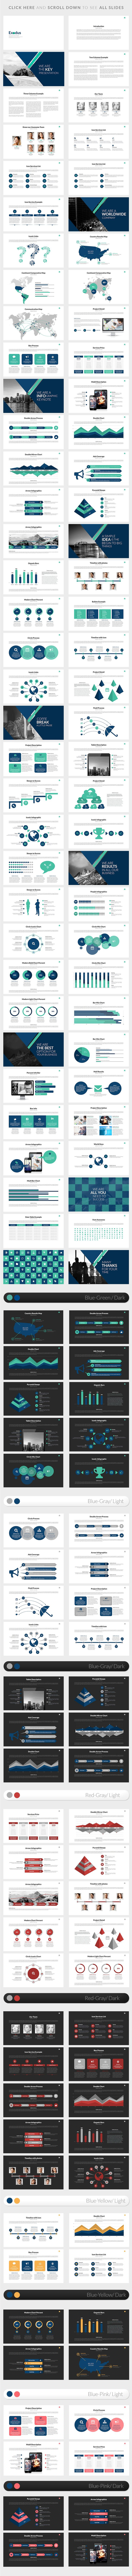 Exodus | Powerpoint Presentation - Presentations - 2